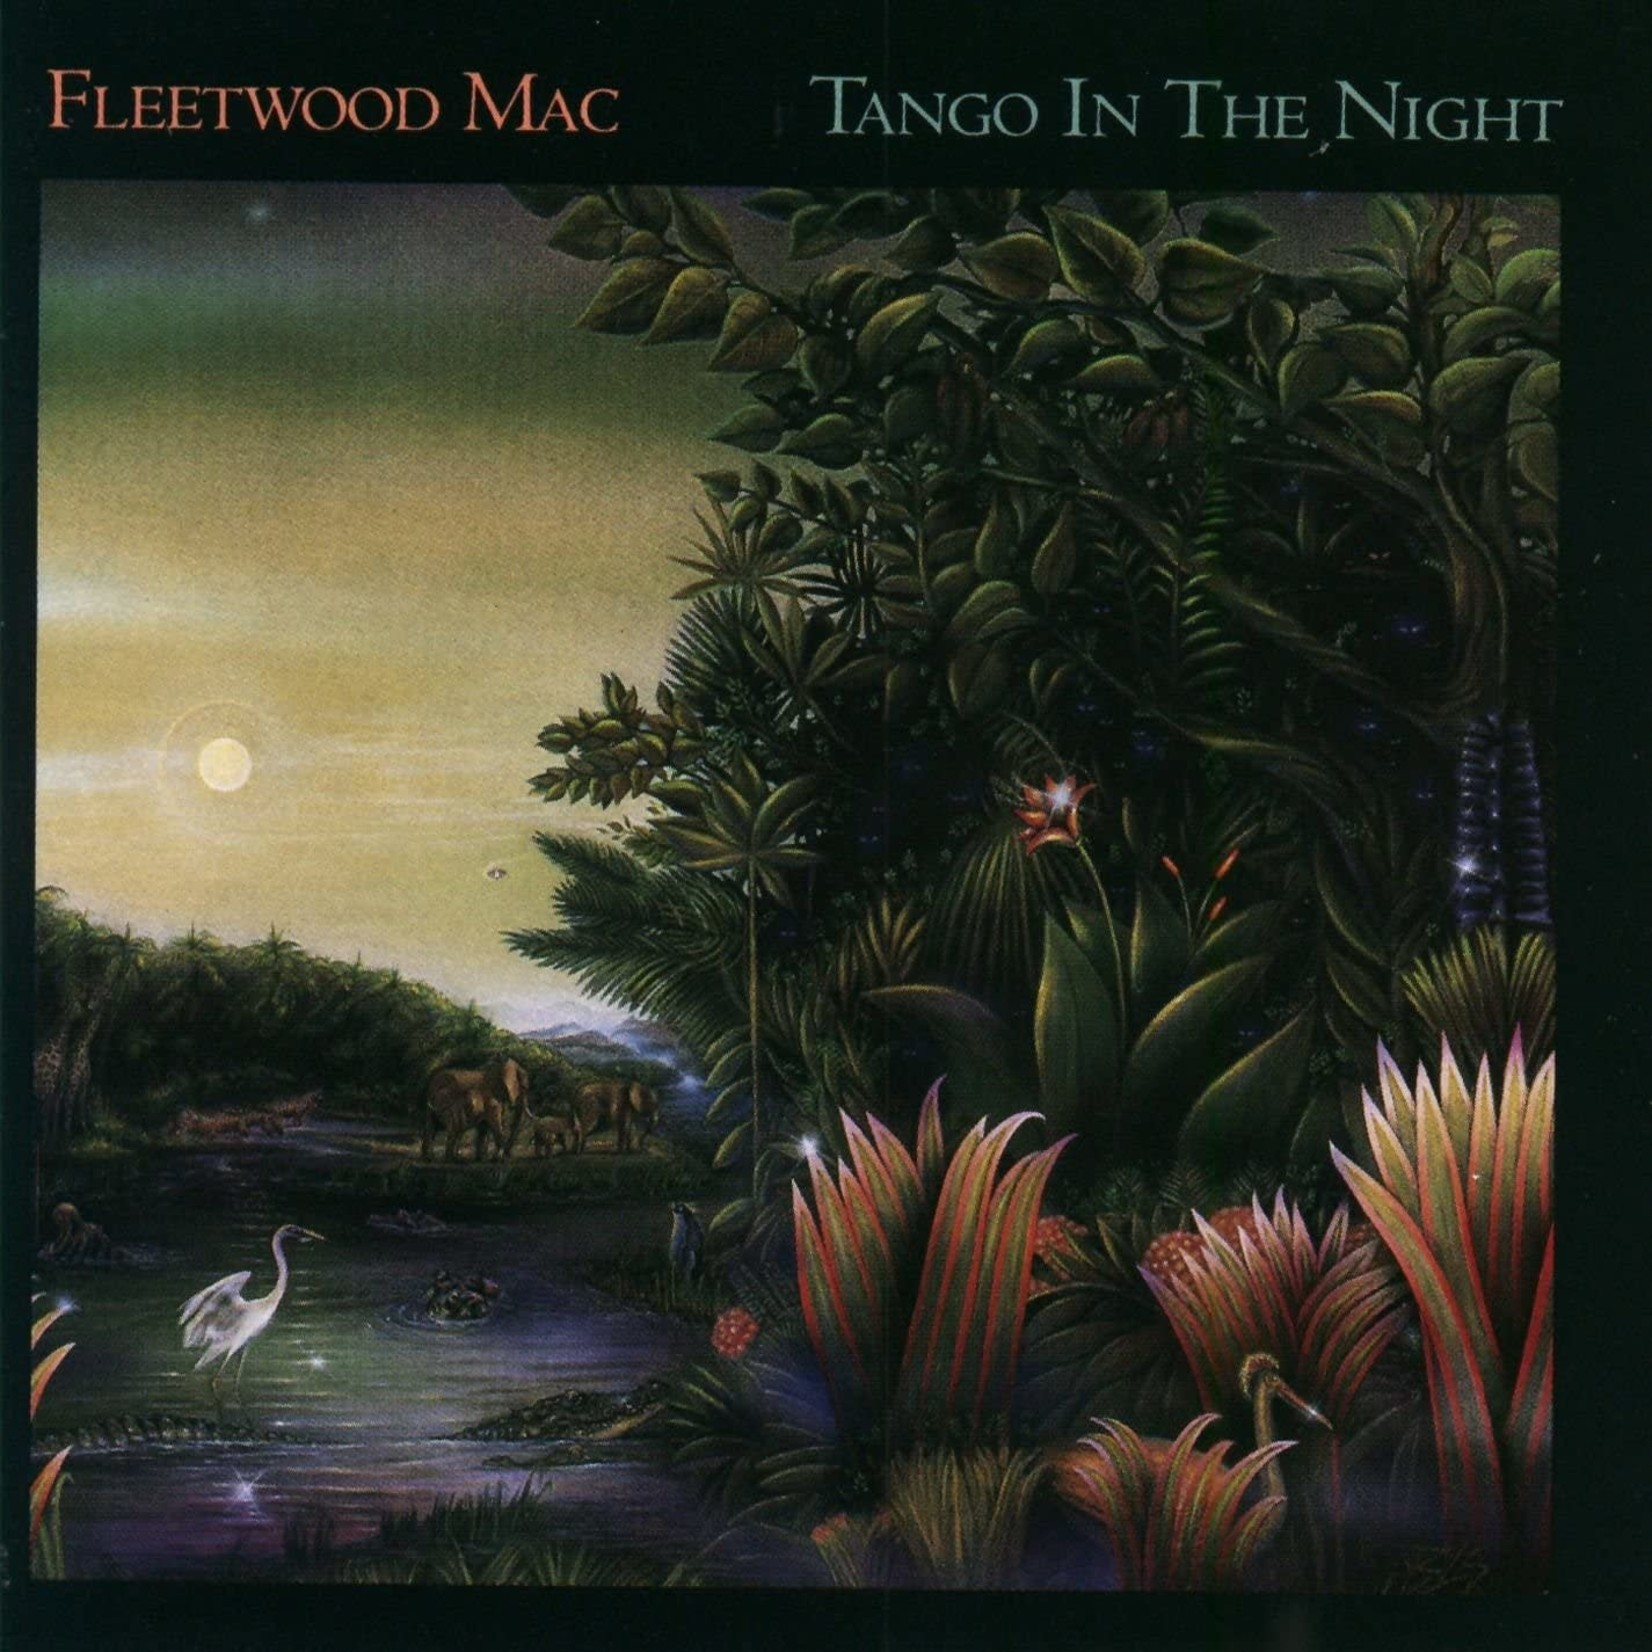 [Vintage] Fleetwood Mac: Tango in the Night